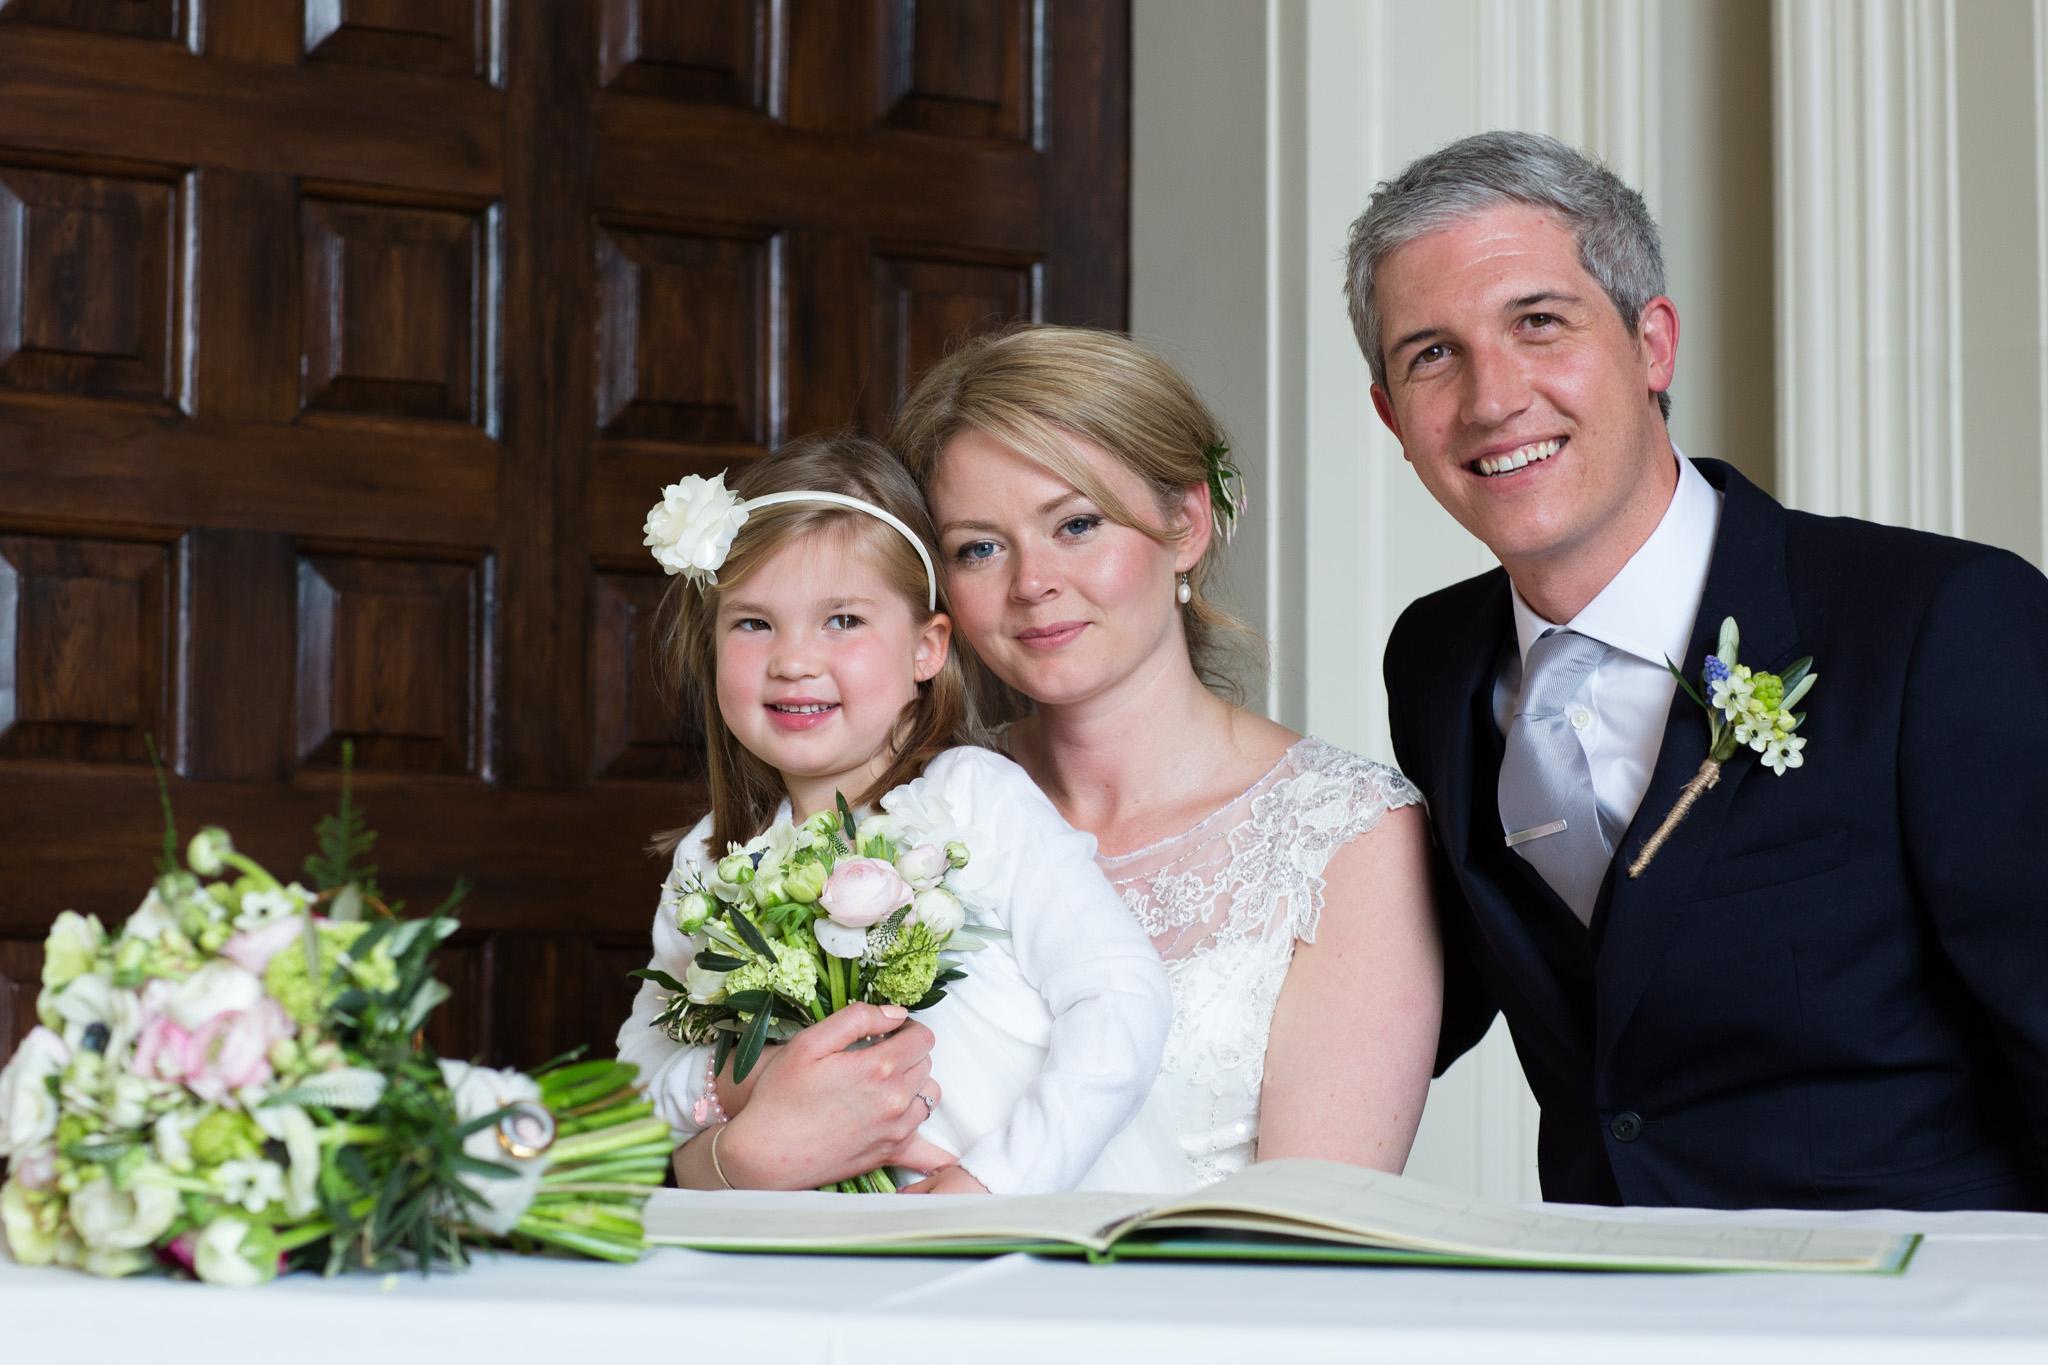 Mark_Barnes_Gloucester_Wedding_Photographer_Elmore_Court_Wedding_Photography_Mike+Kelly-51.jpg